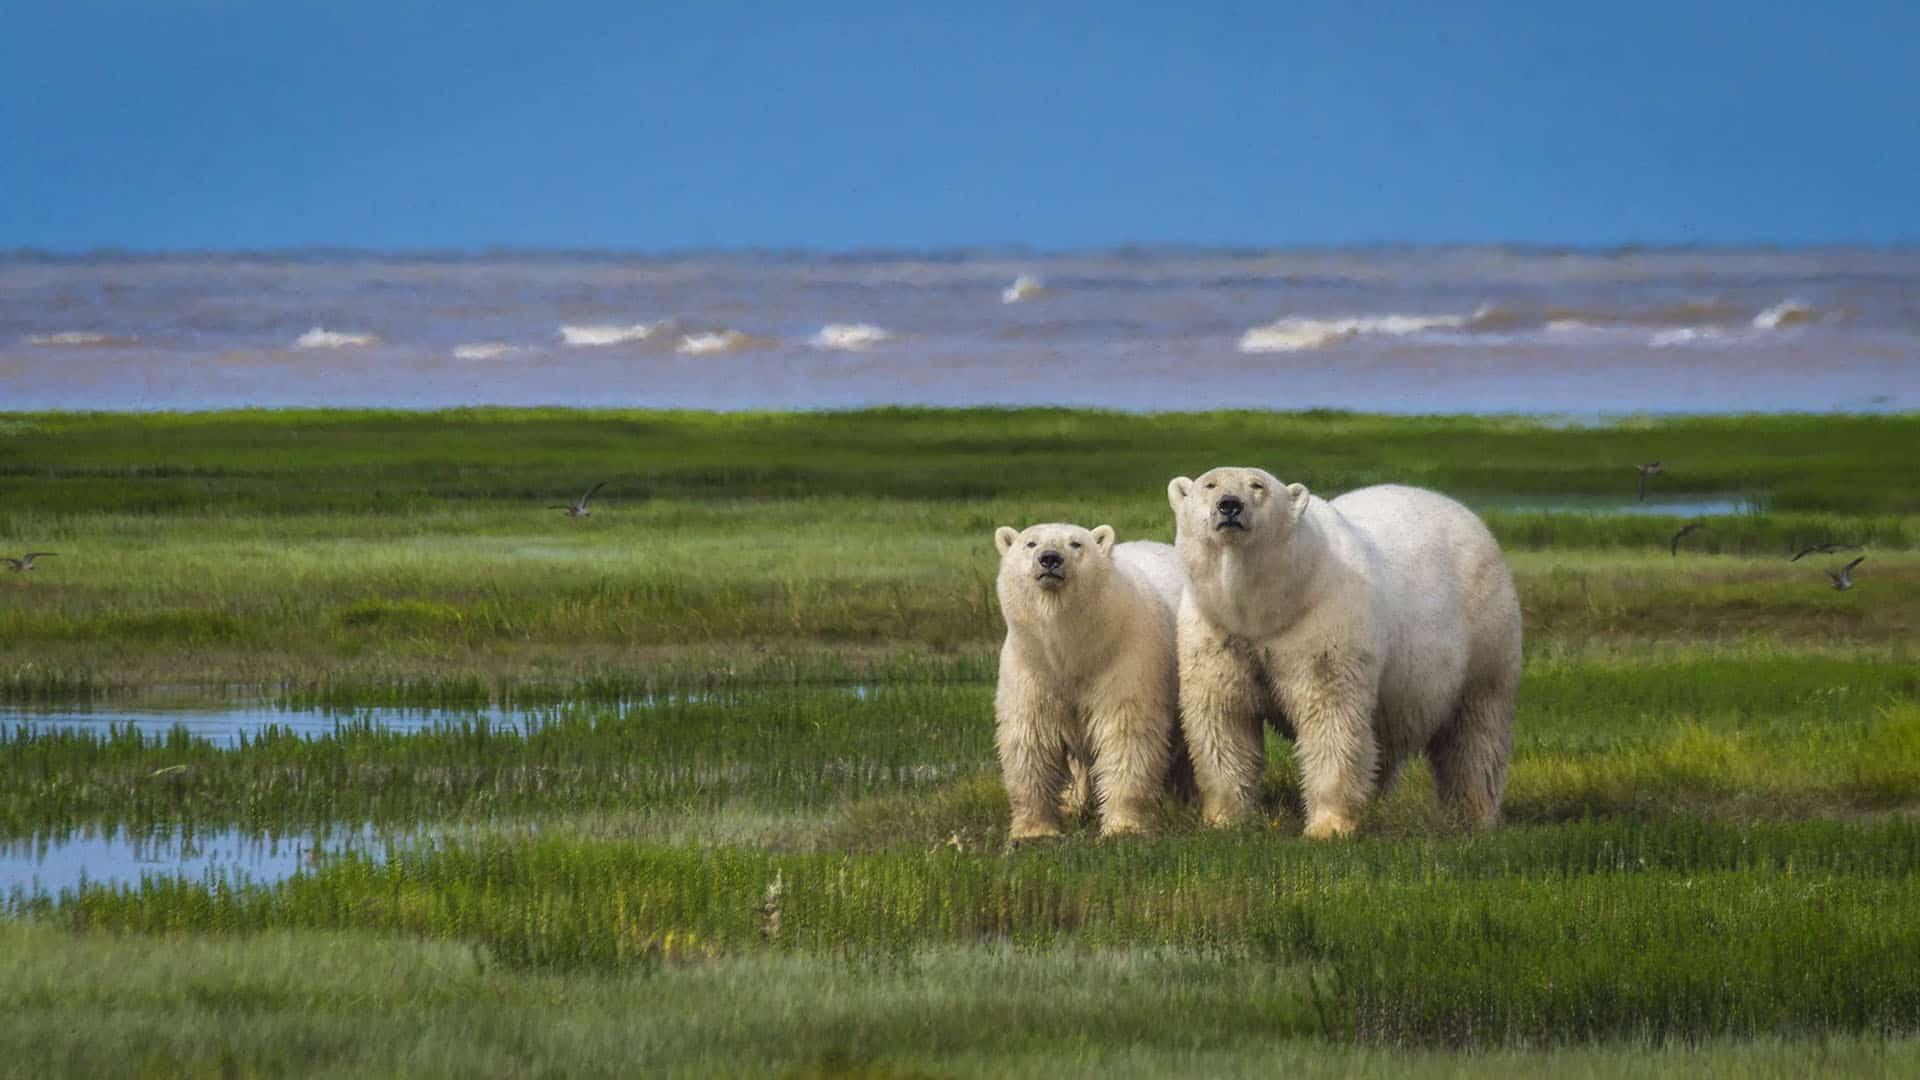 polar bears in manitoba canada